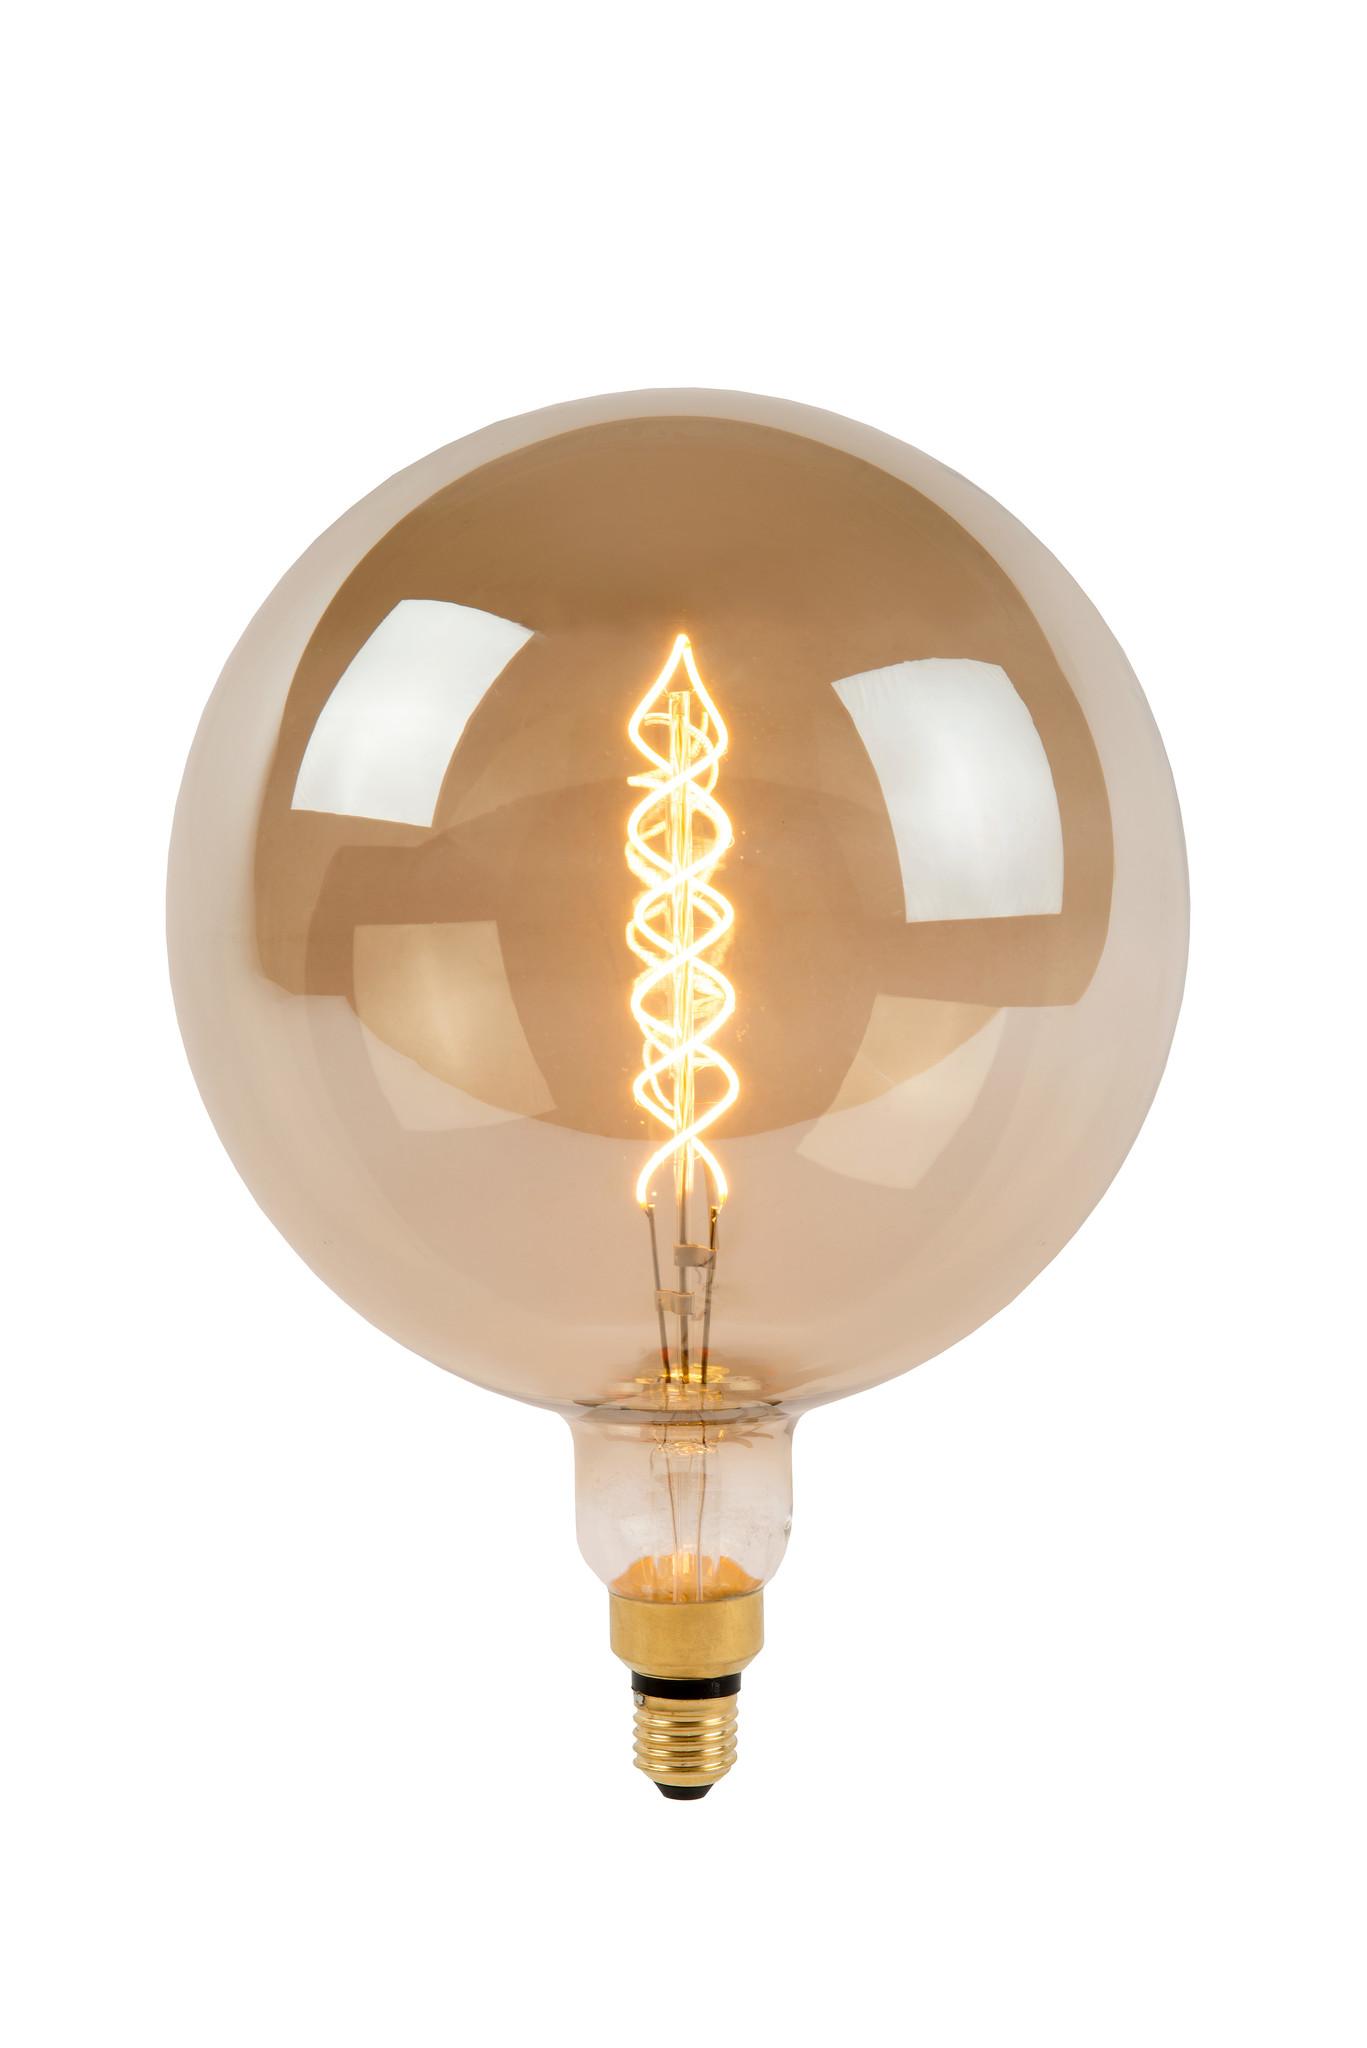 Lucide G250 GIA. Fil. lamp-Fumé-LED Dimb.-1xE27-10W-2200K